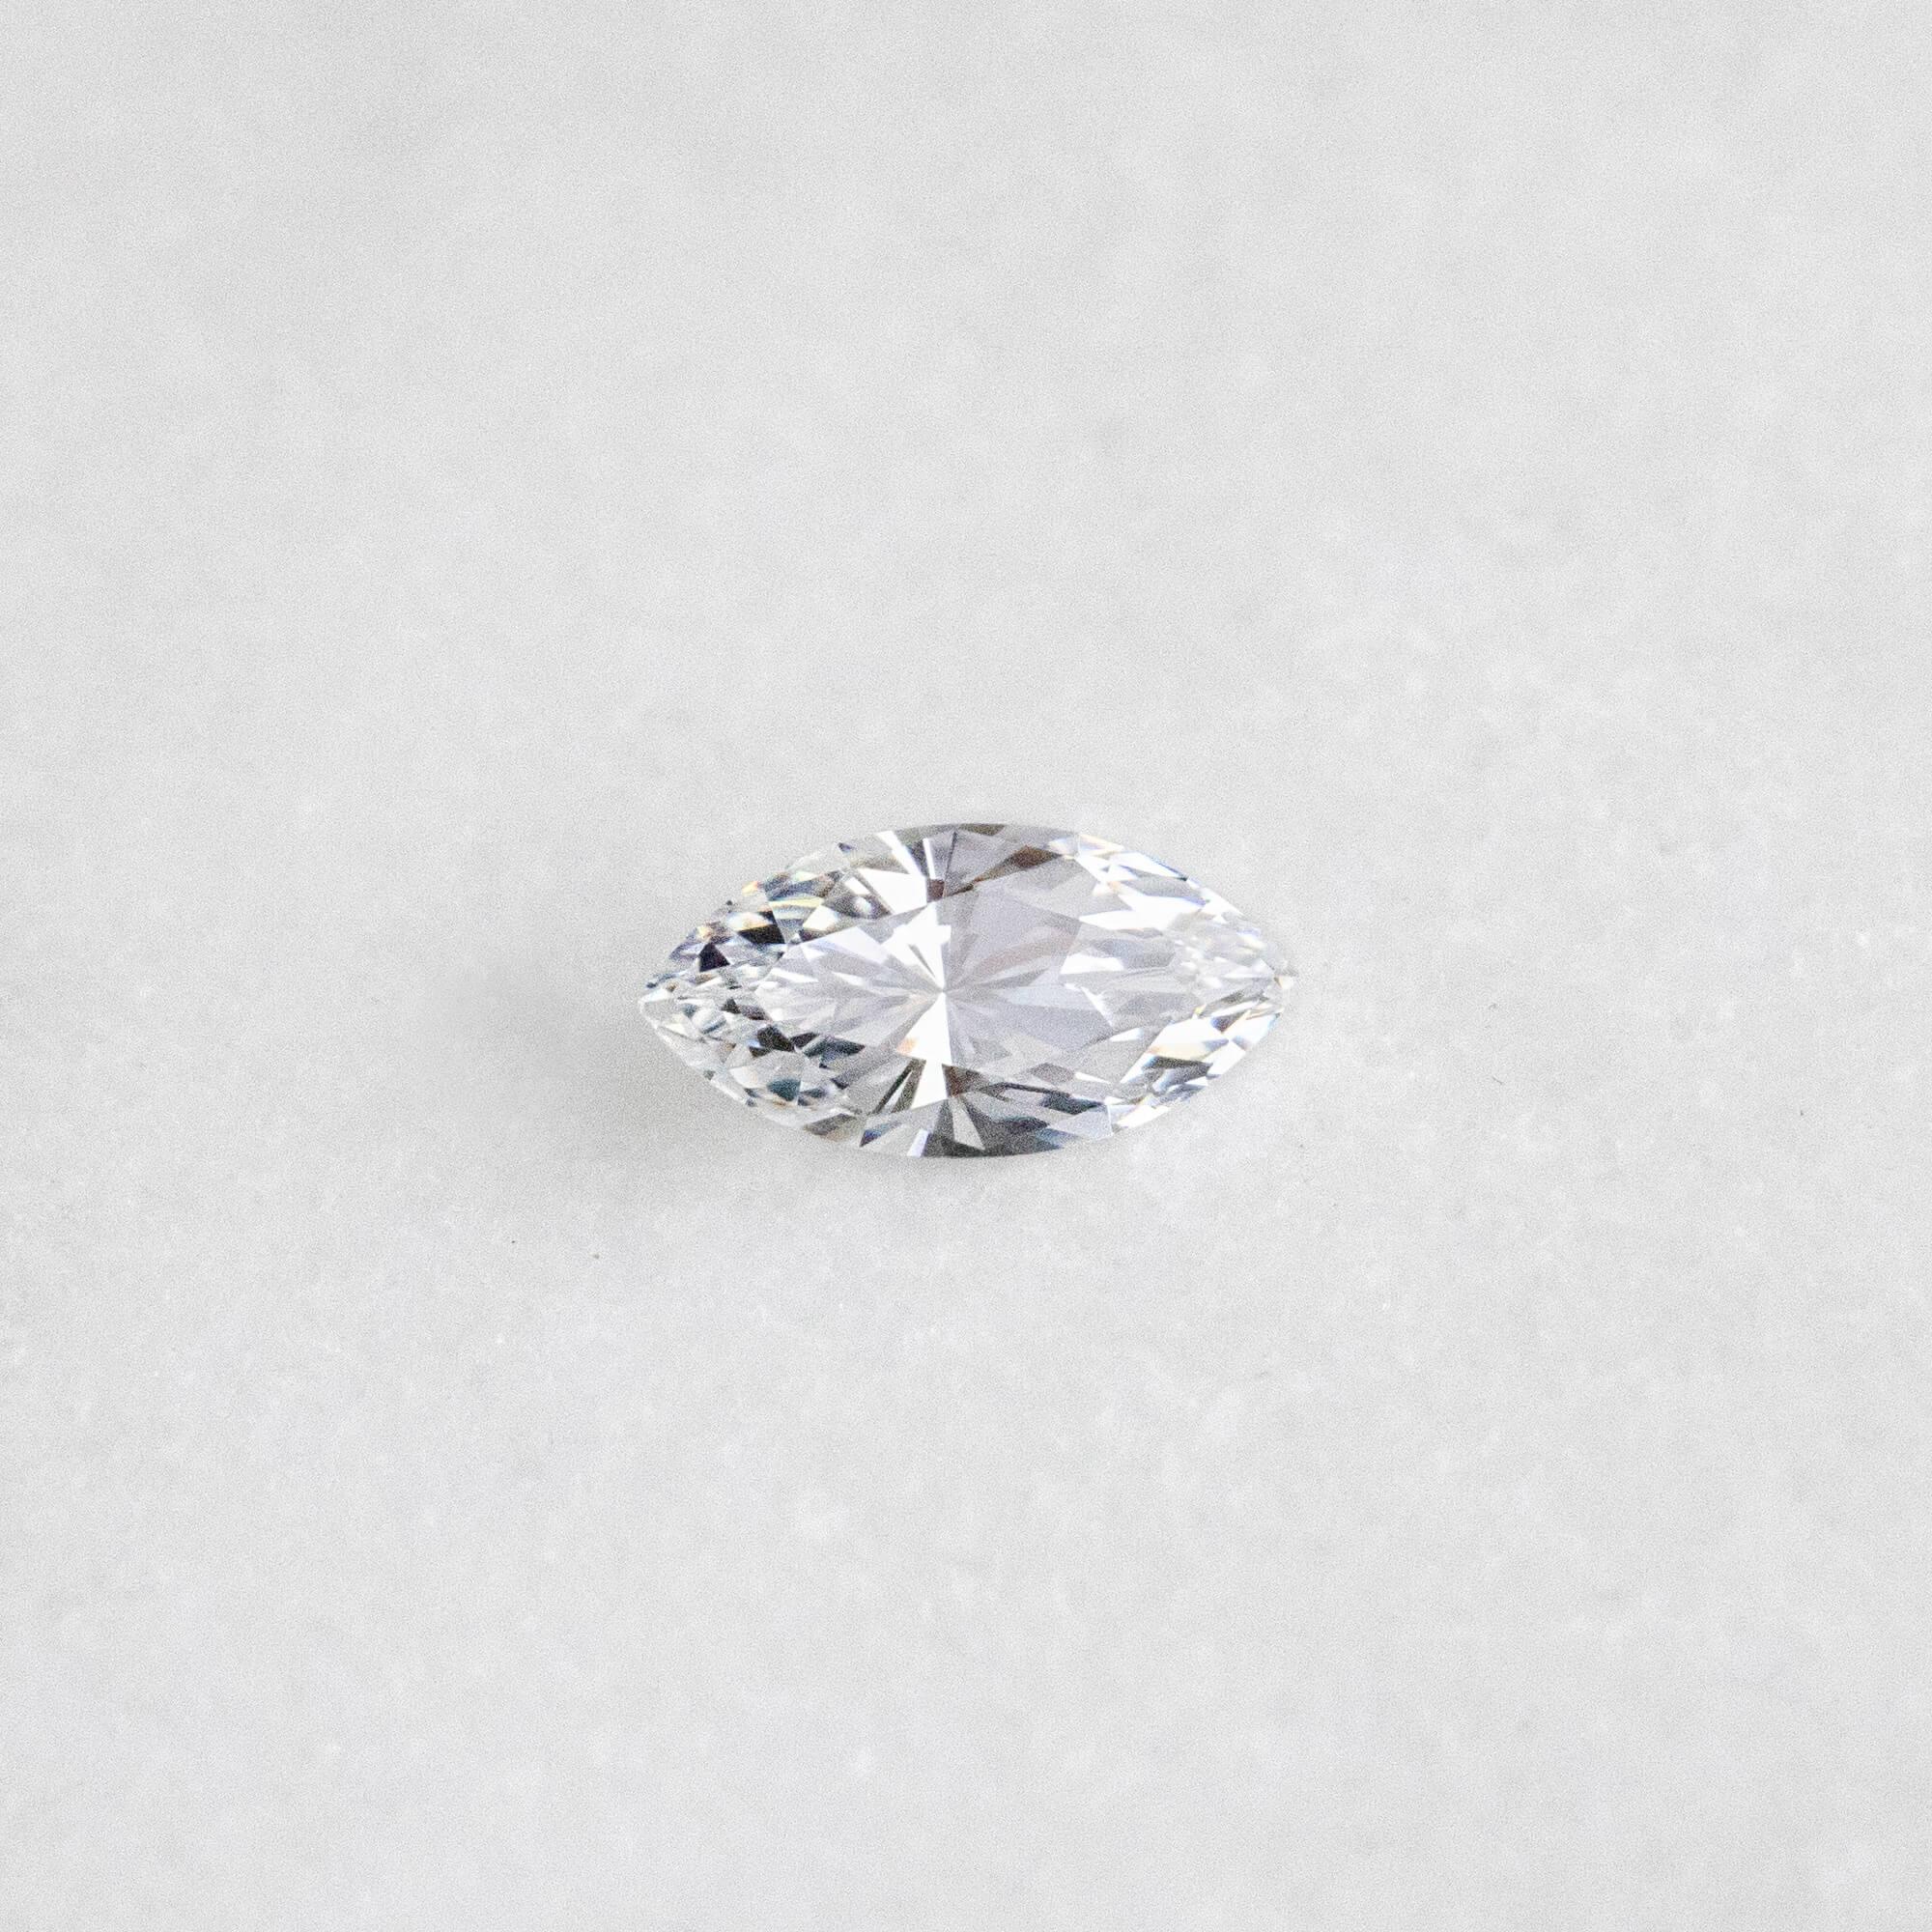 A Marquise Nexus Diamond alternative.